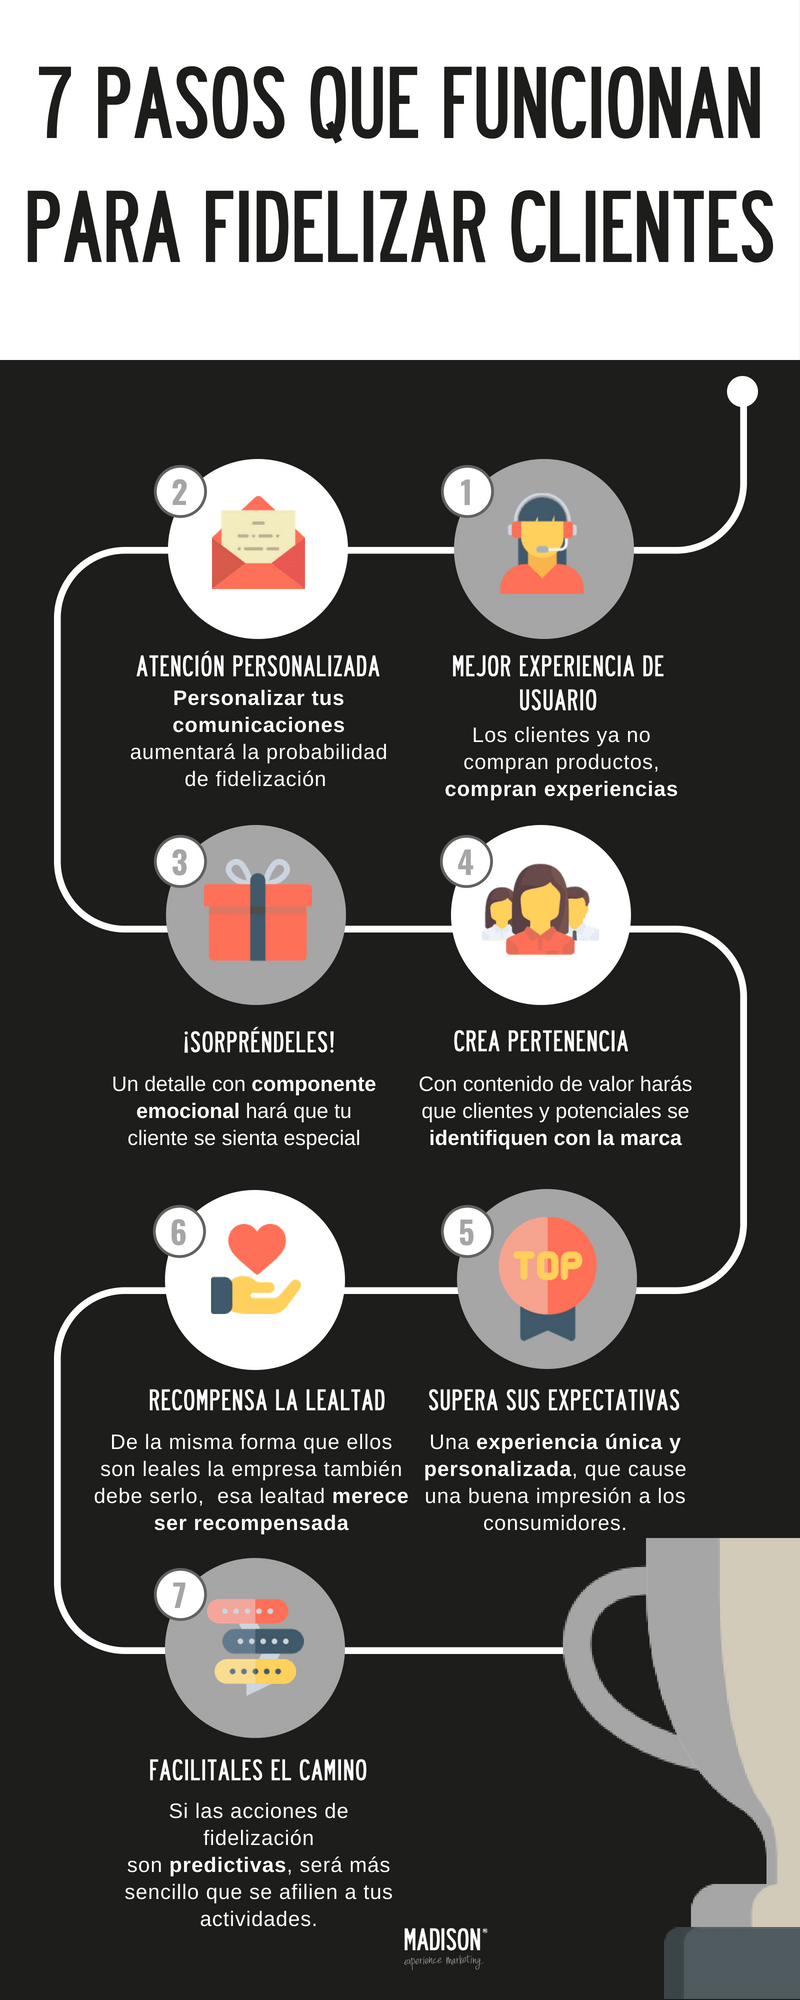 7 Pasos Para Fidelizar A Un Cliente Infografia Infographic Marketing Tics Y Formación Clientes Dificiles Gestión De Clientes Marketing Para Restaurantes